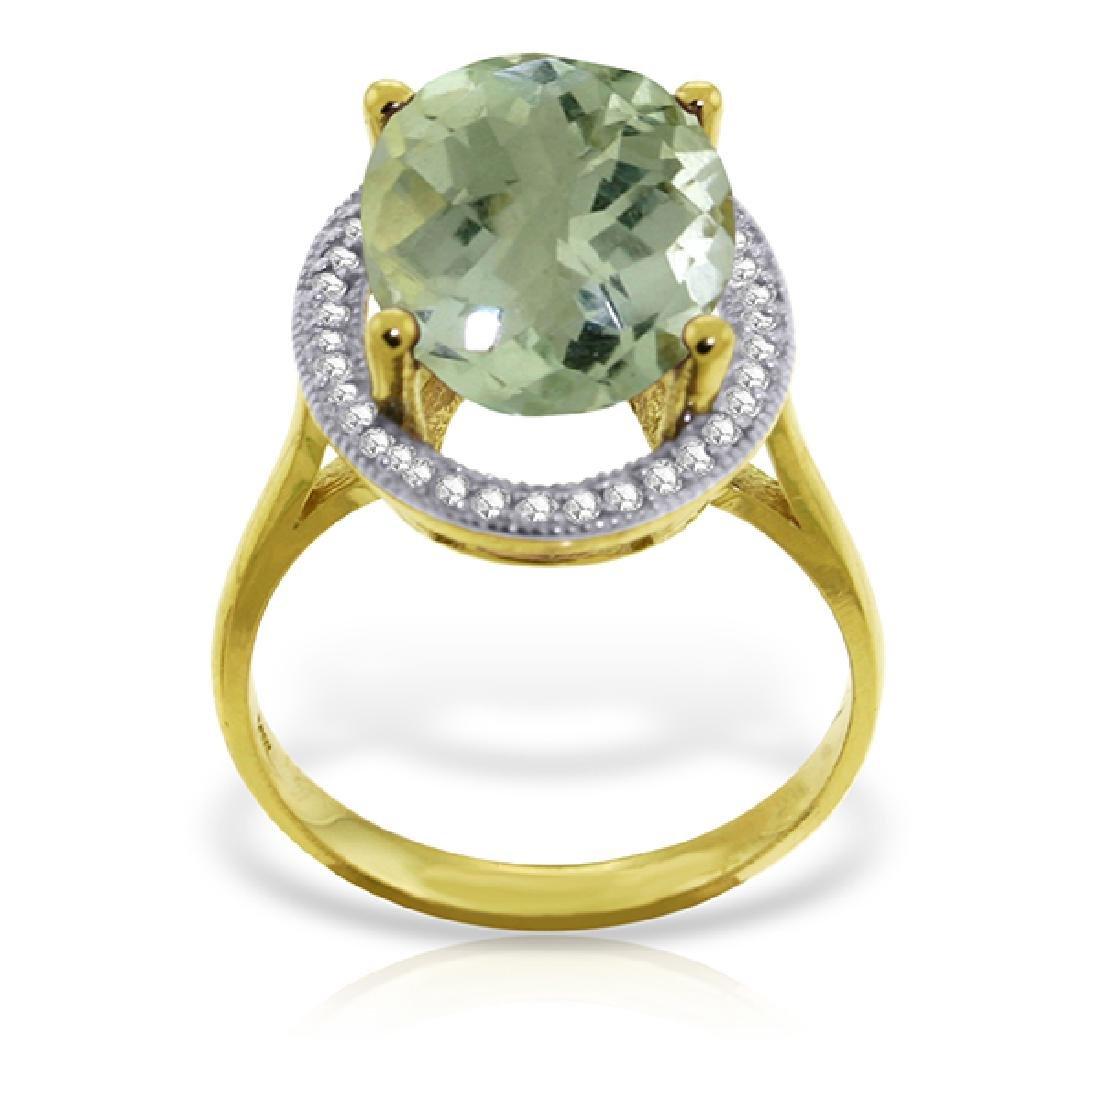 Genuine 5.28 ctw Green Amethyst & Diamond Ring Jewelry